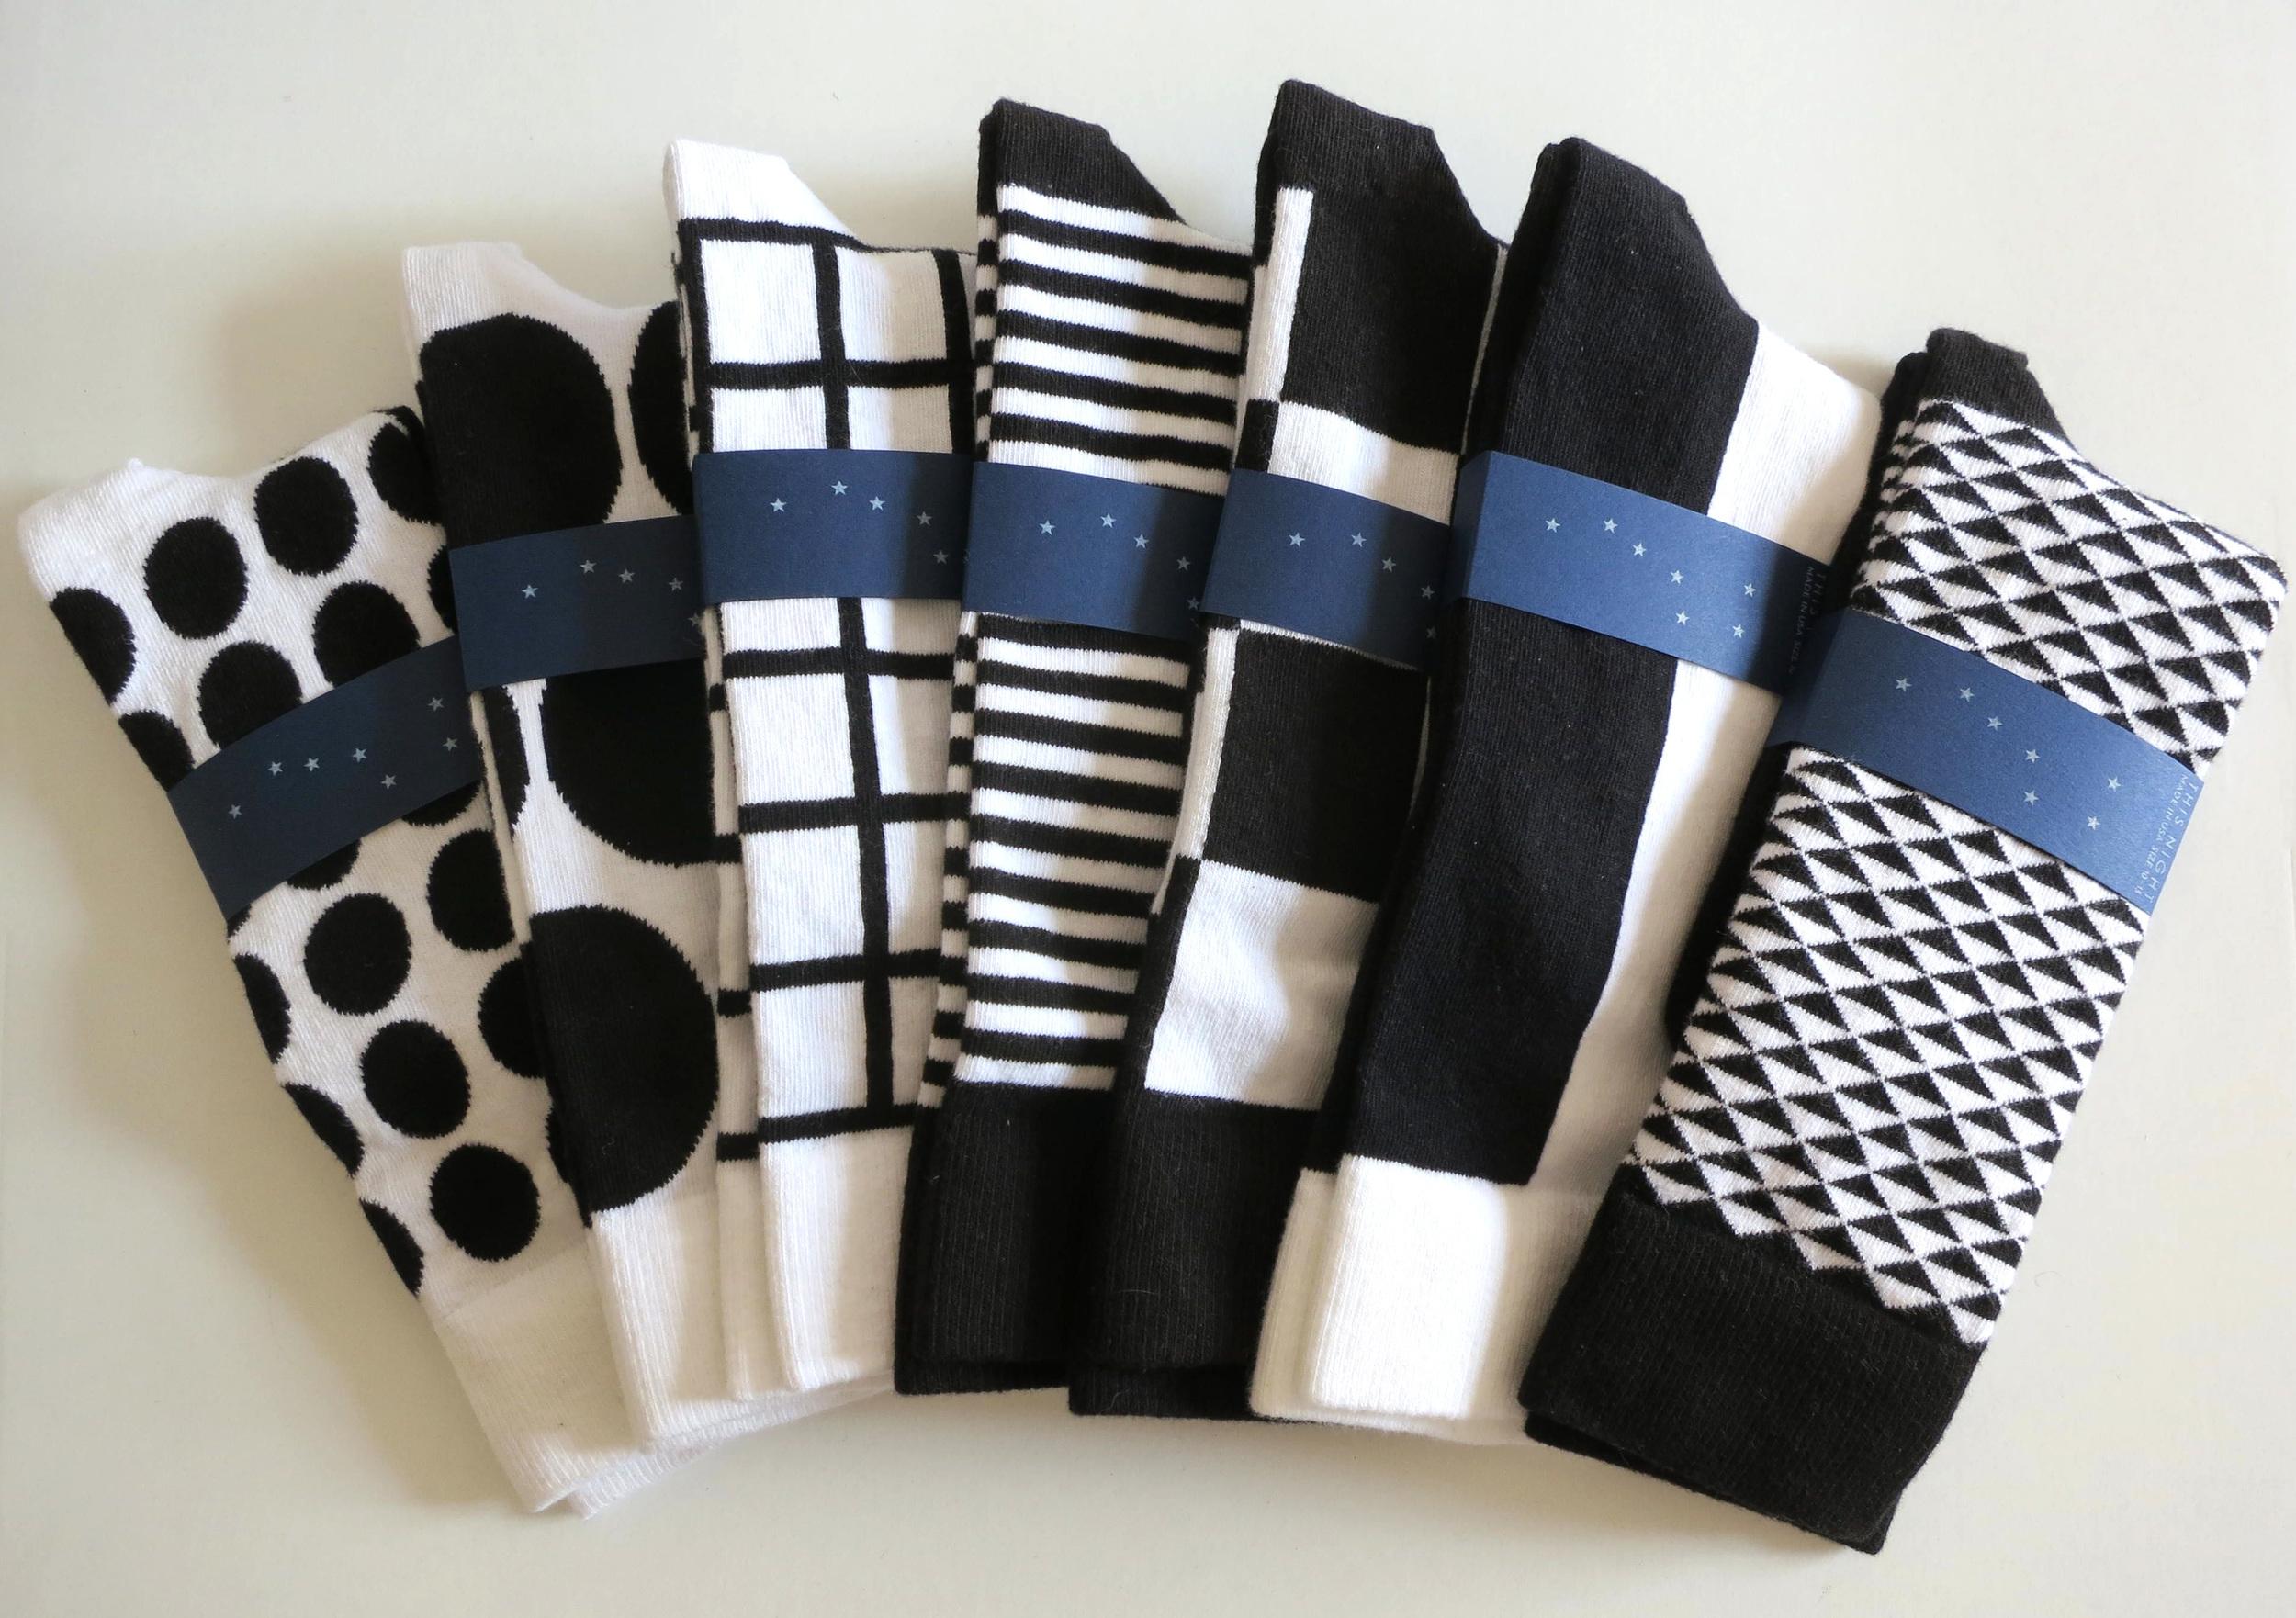 POLKA, DOTTY, GRID, STRIPE, CHECK, HALF, and KYOTO in black and white